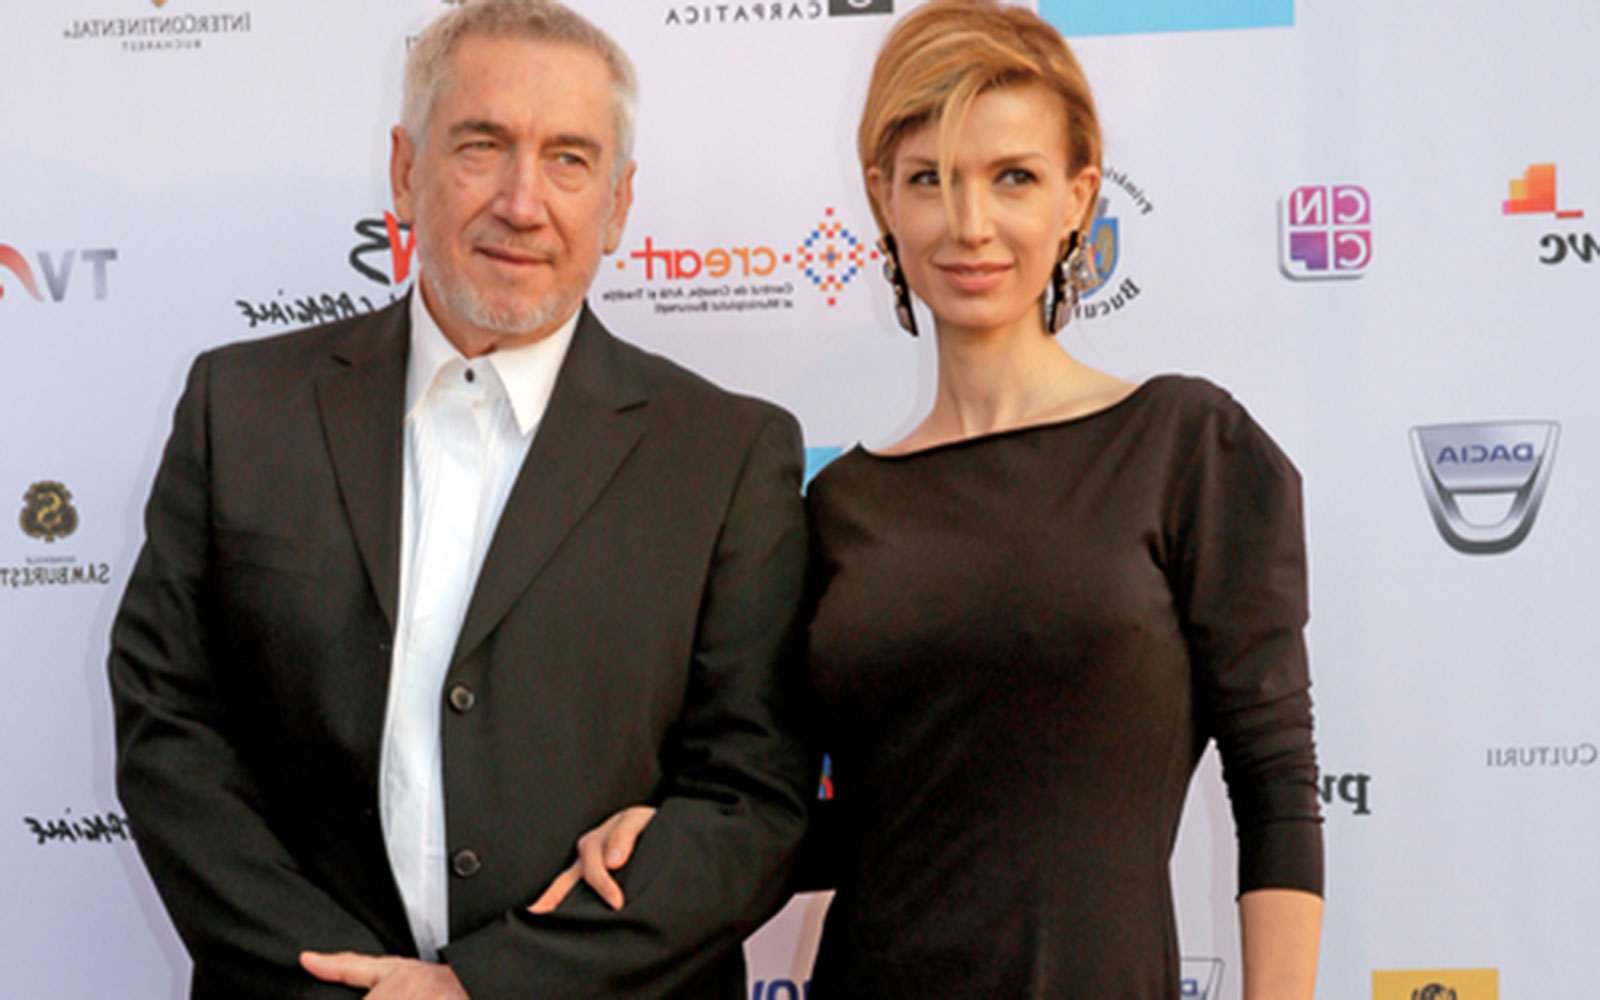 Casatorit Alina Chivulescu Dan Chisu Imagine Mireasa Verdict Ro